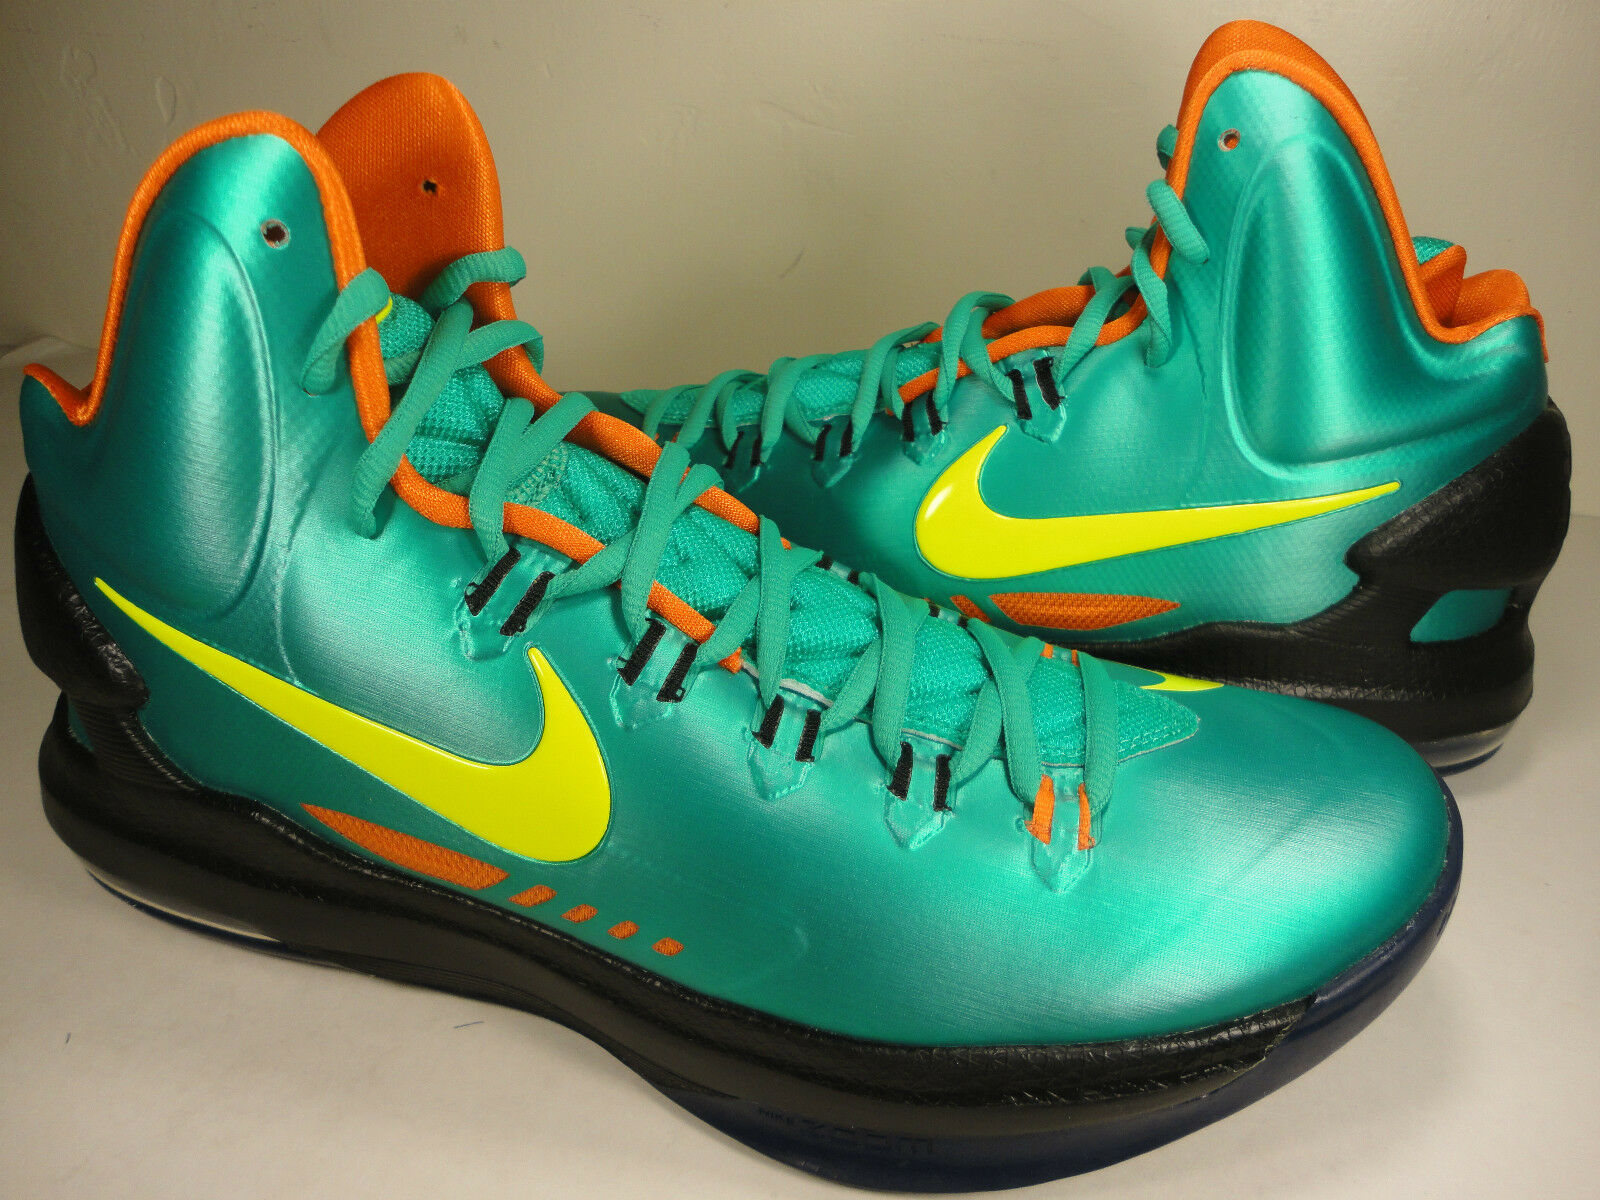 Nike Zoom KD V 5 iD Green Yelfaible Orange noir SZ 11 (607467-991)